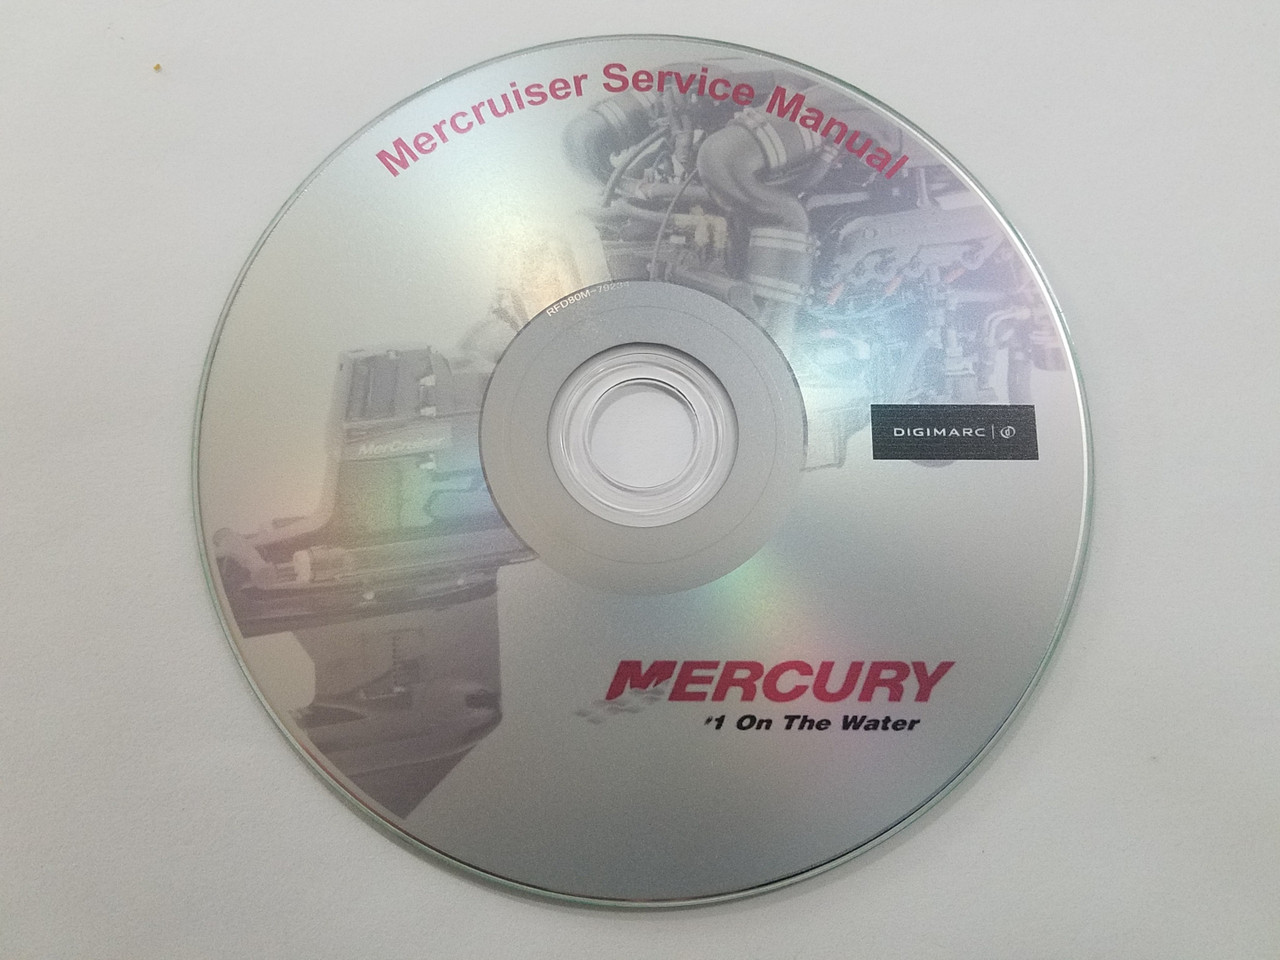 Mercruiser stern drive service manuals